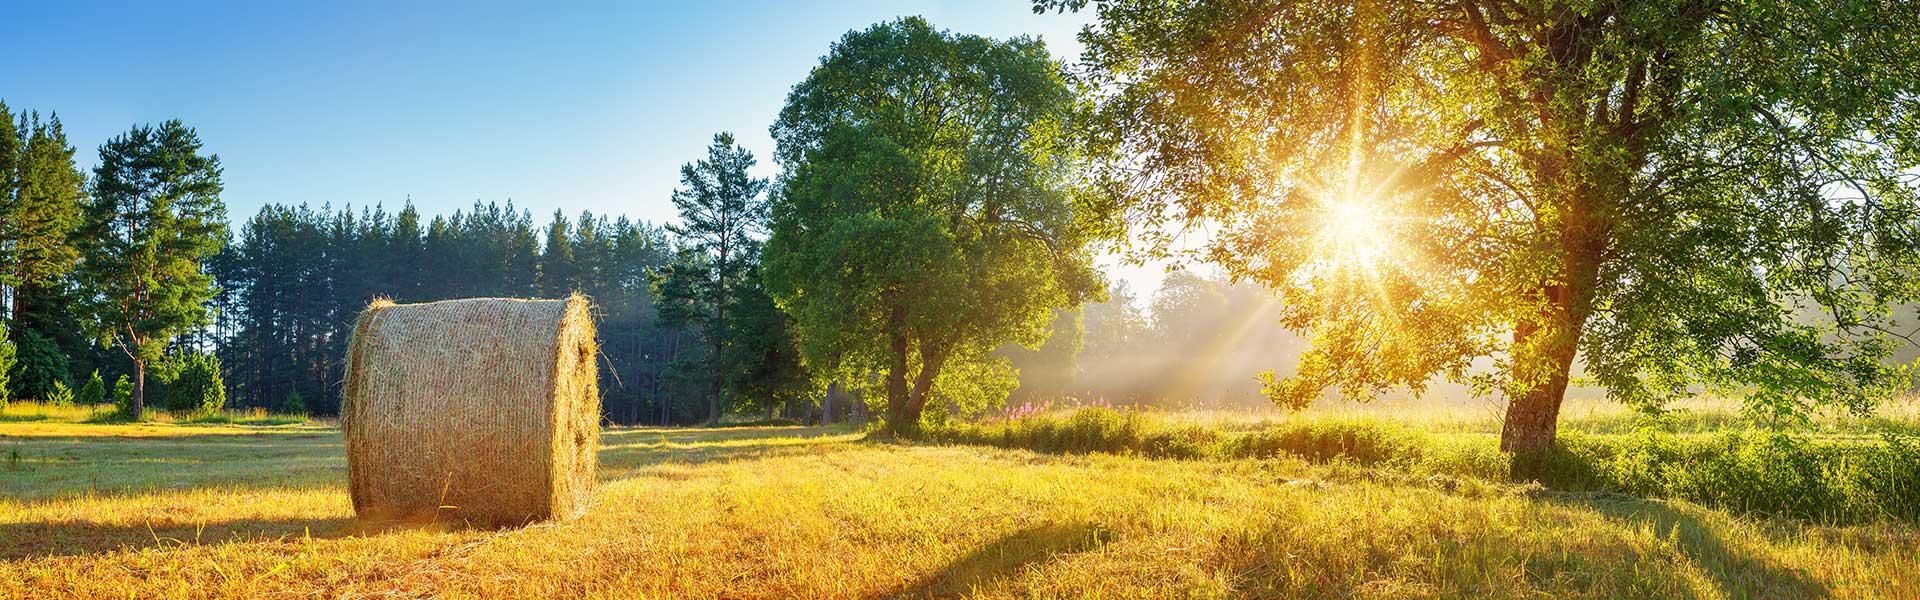 Feld in der Sonne mit Heuballen